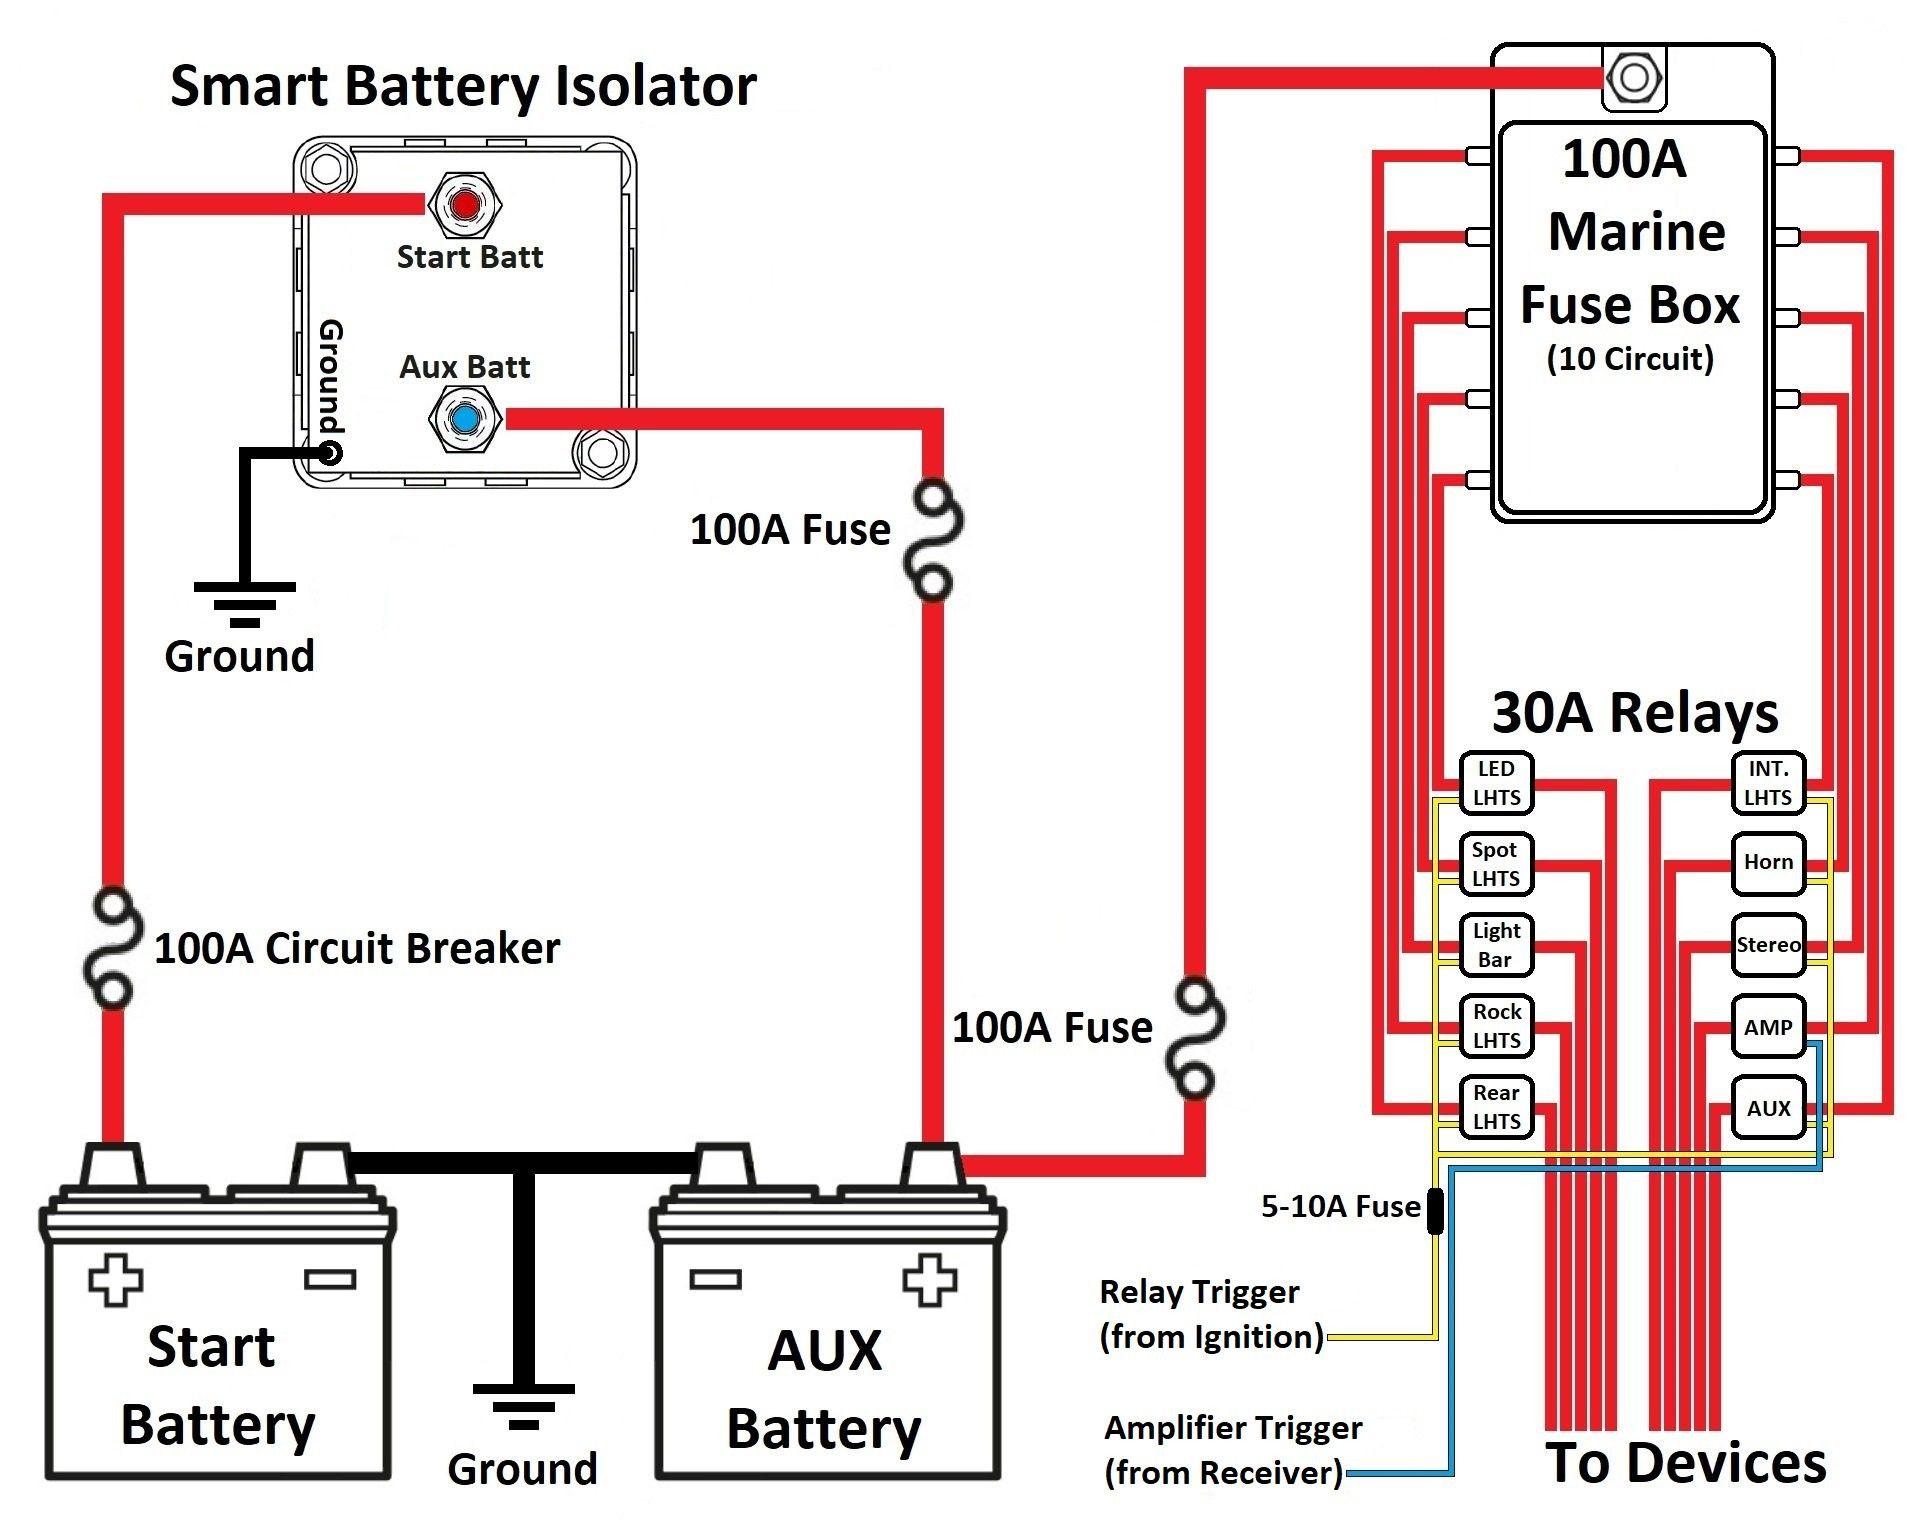 New Wiring Diagram For Dual Alternators Diagrams Digramssample Diagramimages Wiringdiagramsample Wiringdiagram Bootsbau Autoradio Planer